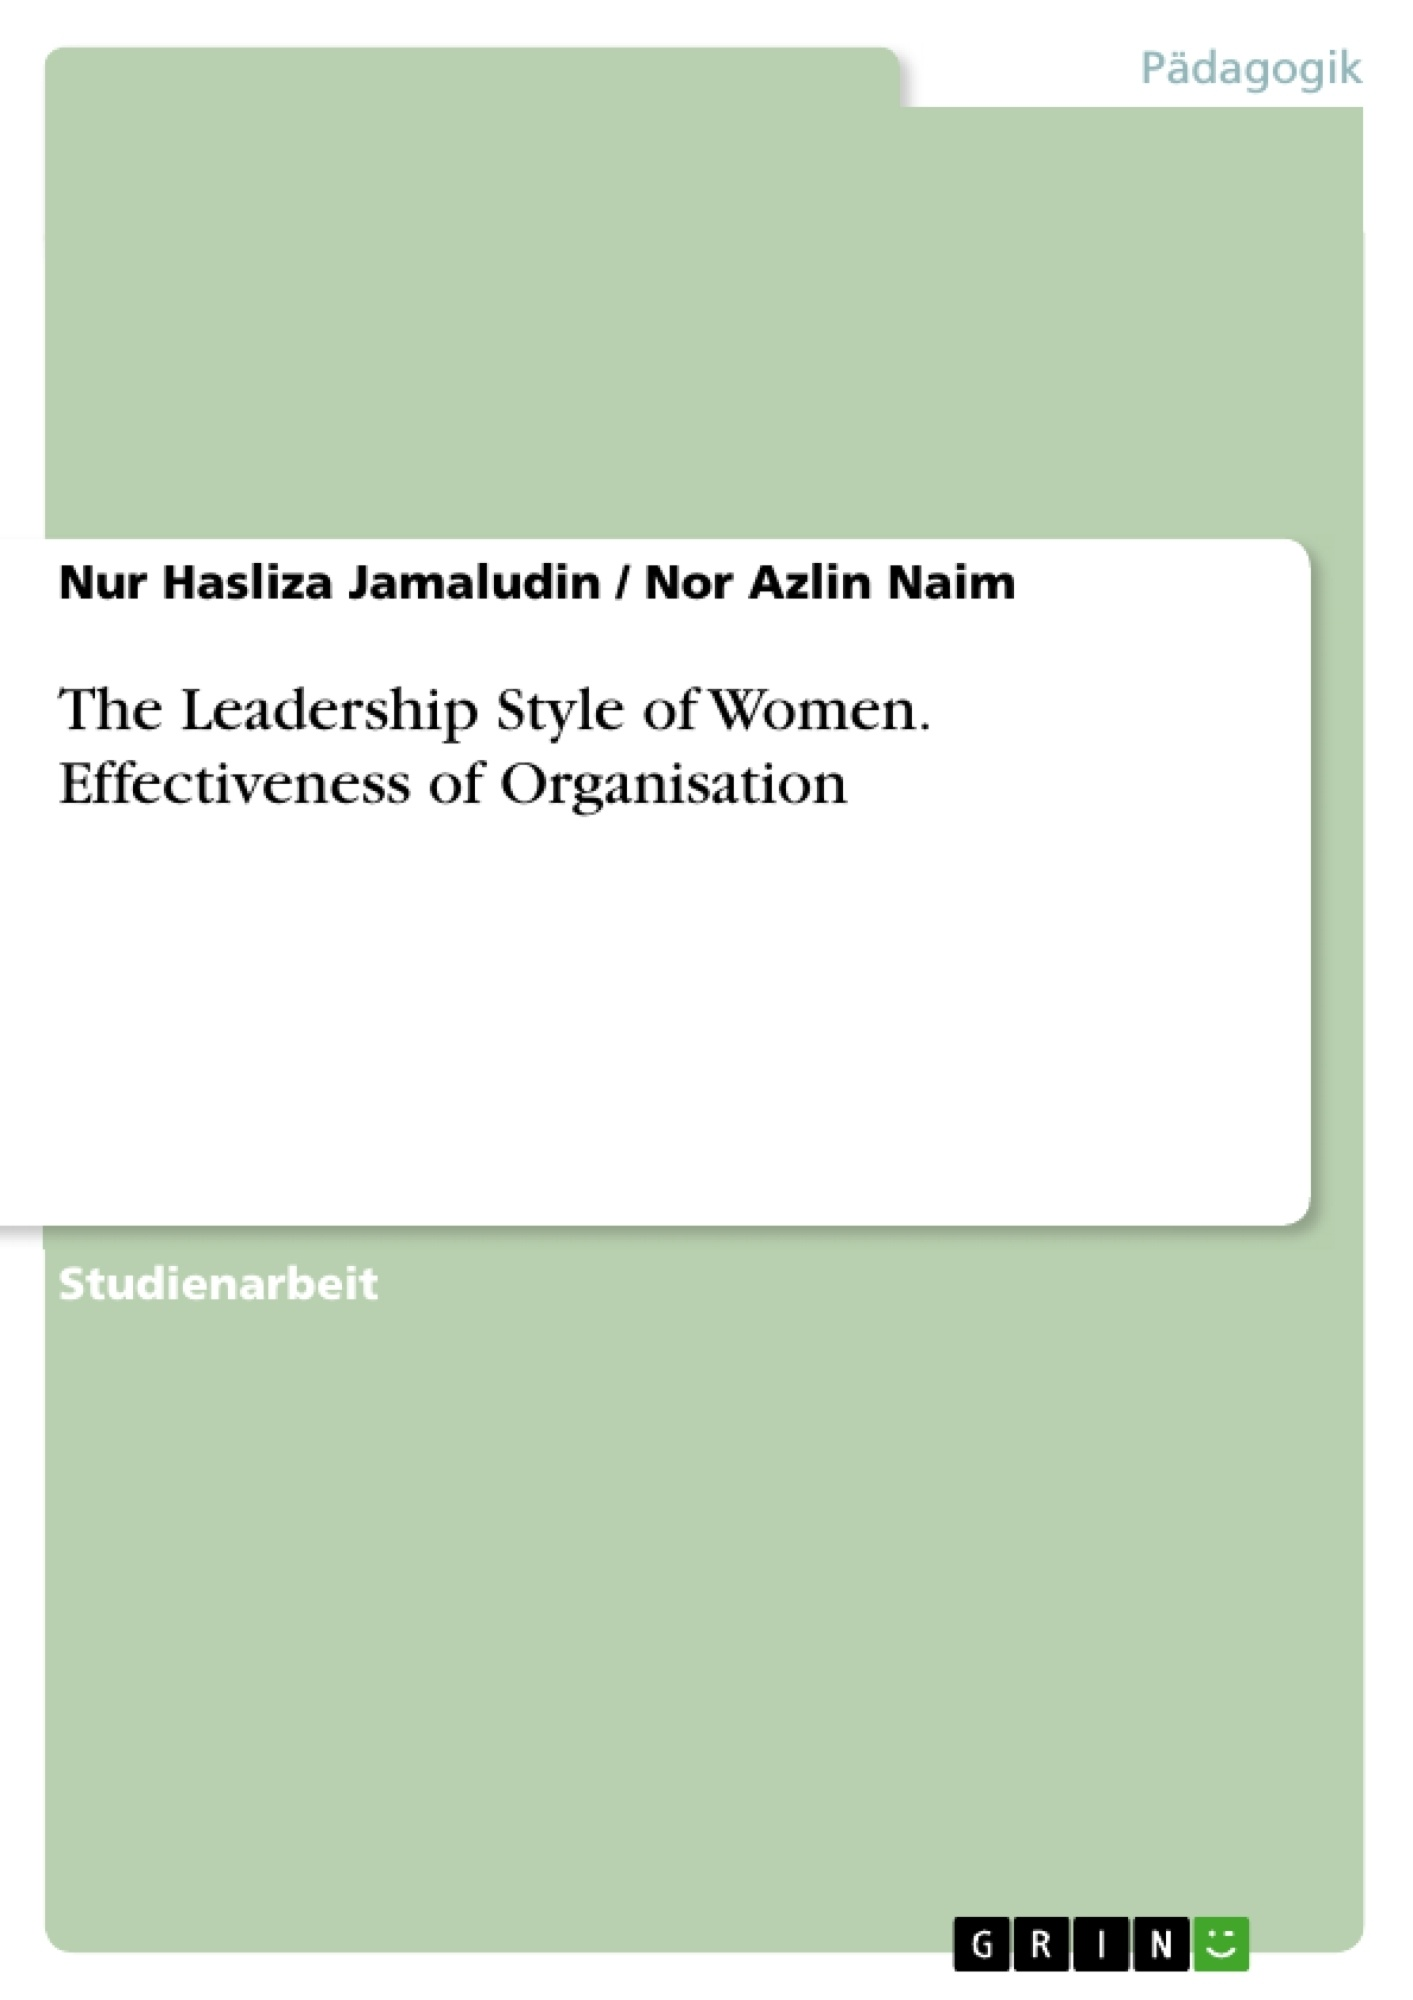 Titel: The Leadership Style of Women. Effectiveness of Organisation